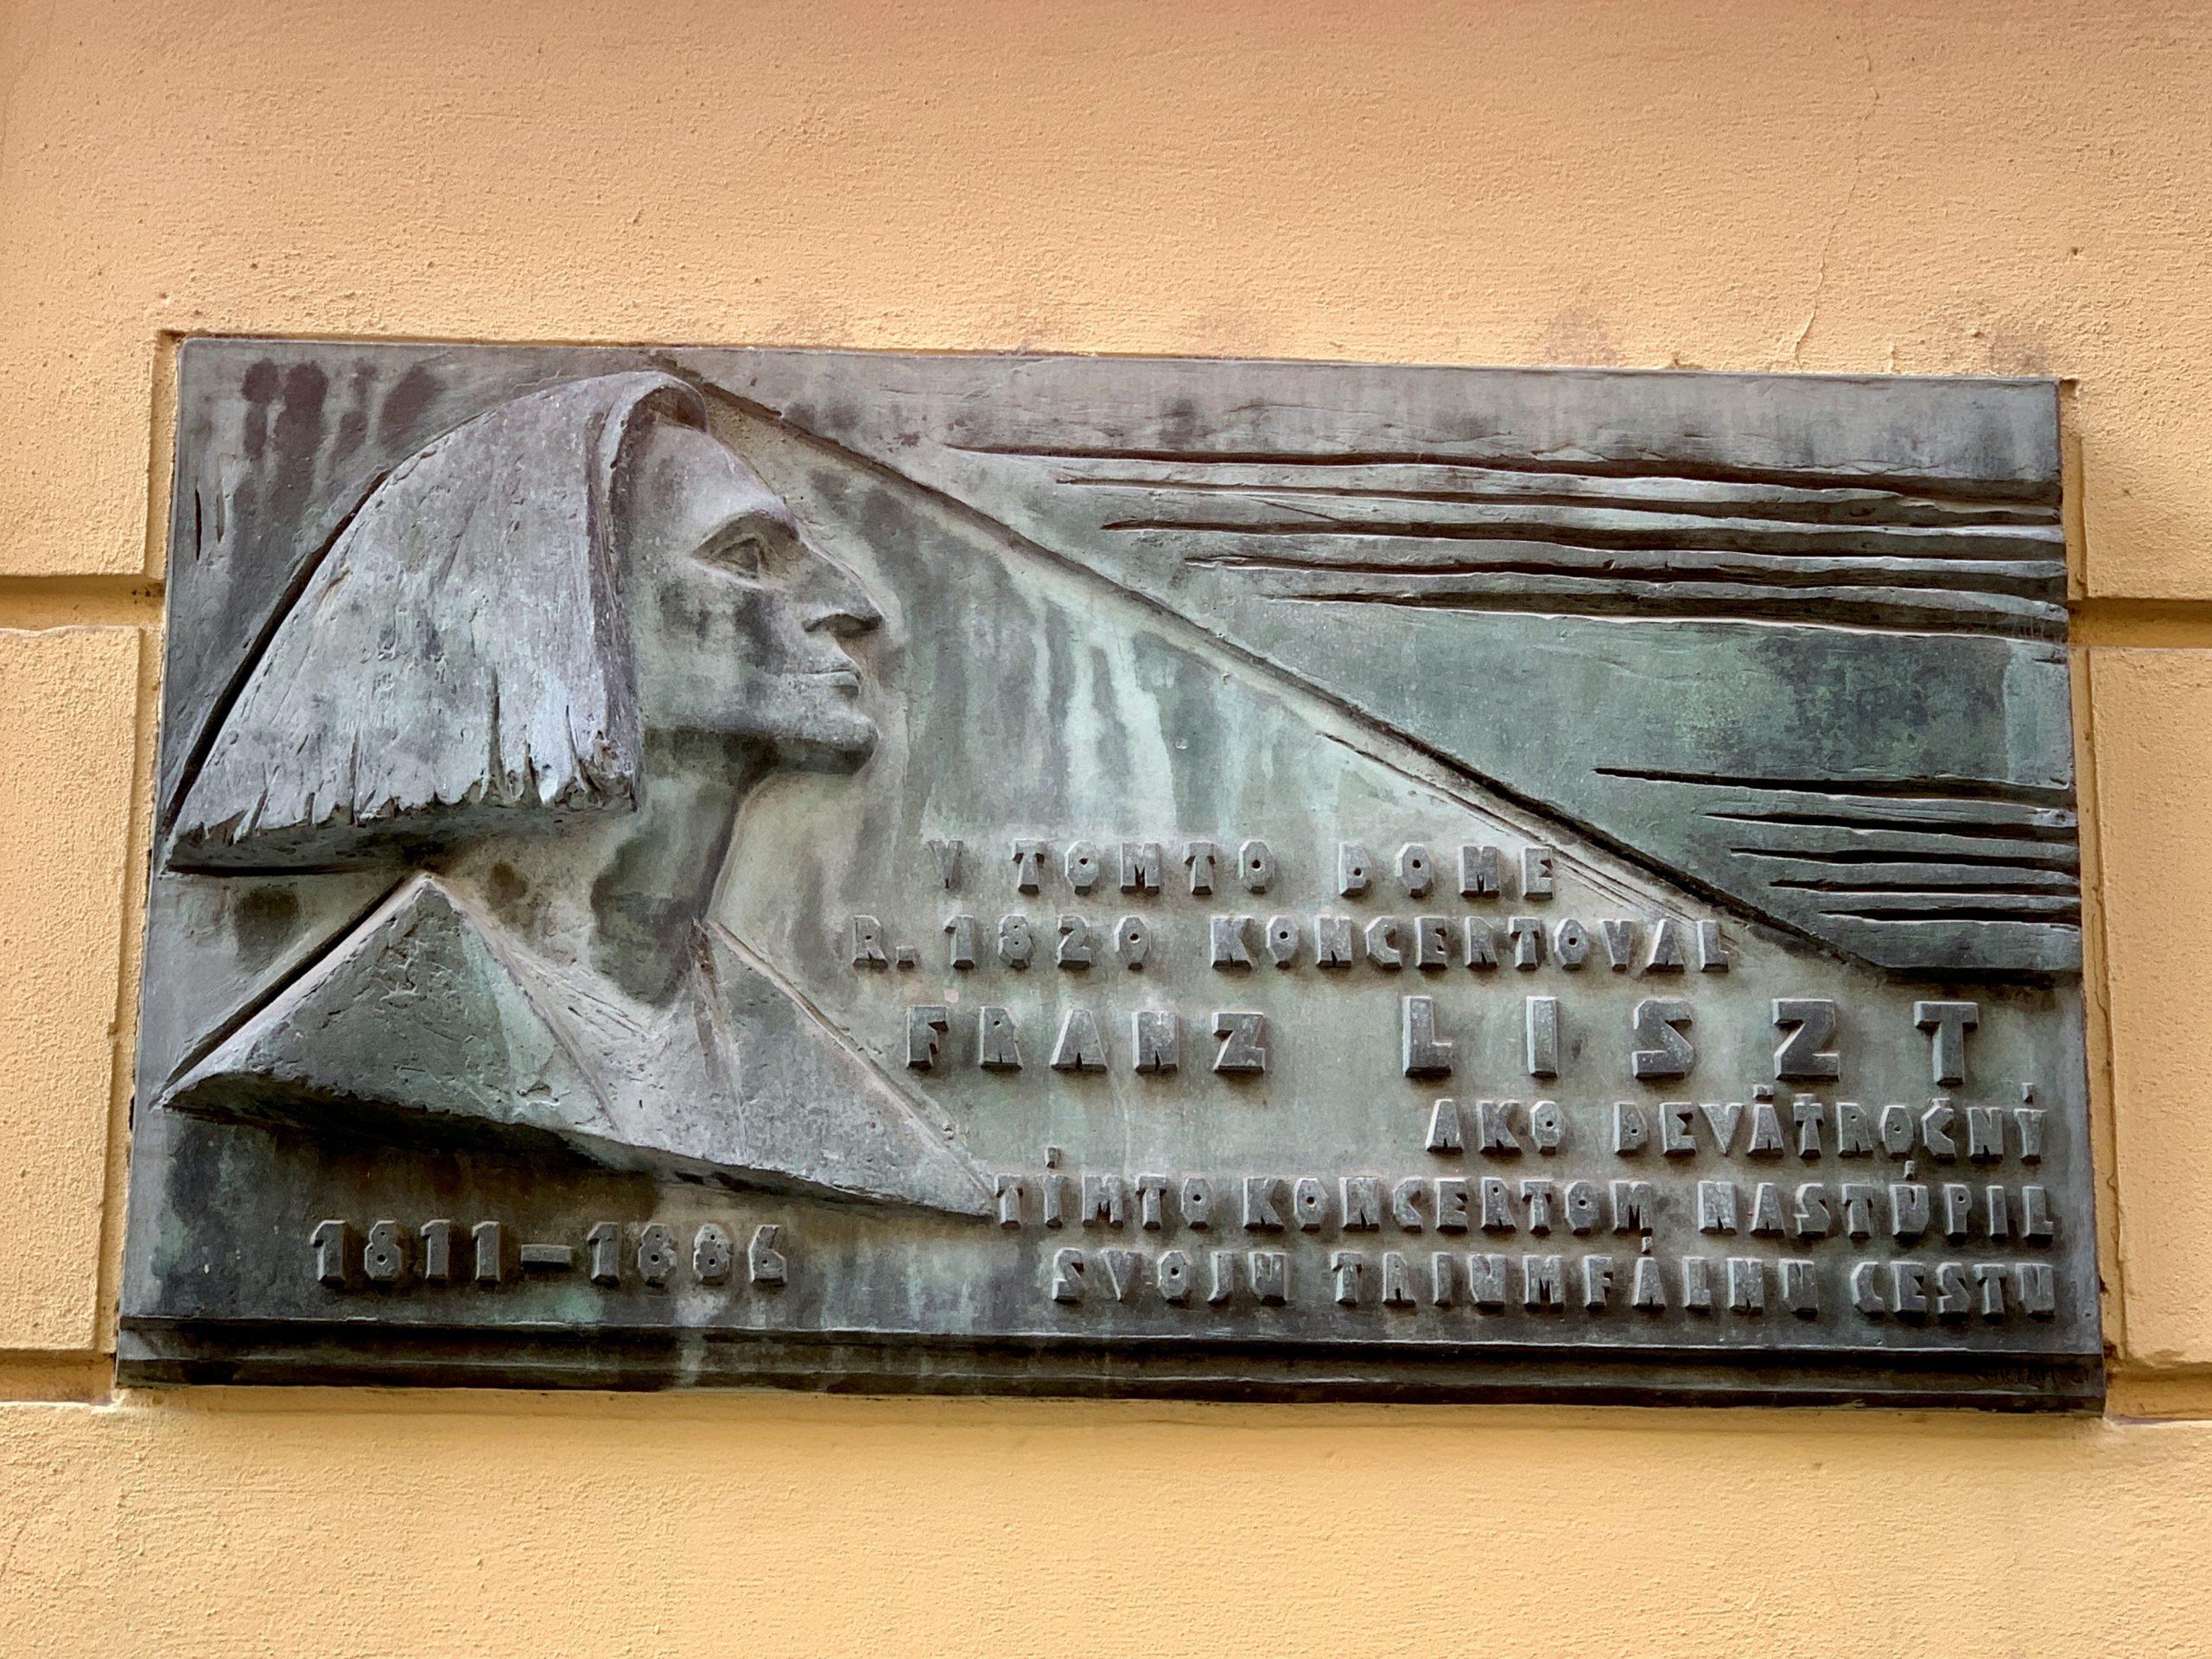 Franz Liszt plaque in Bratislava